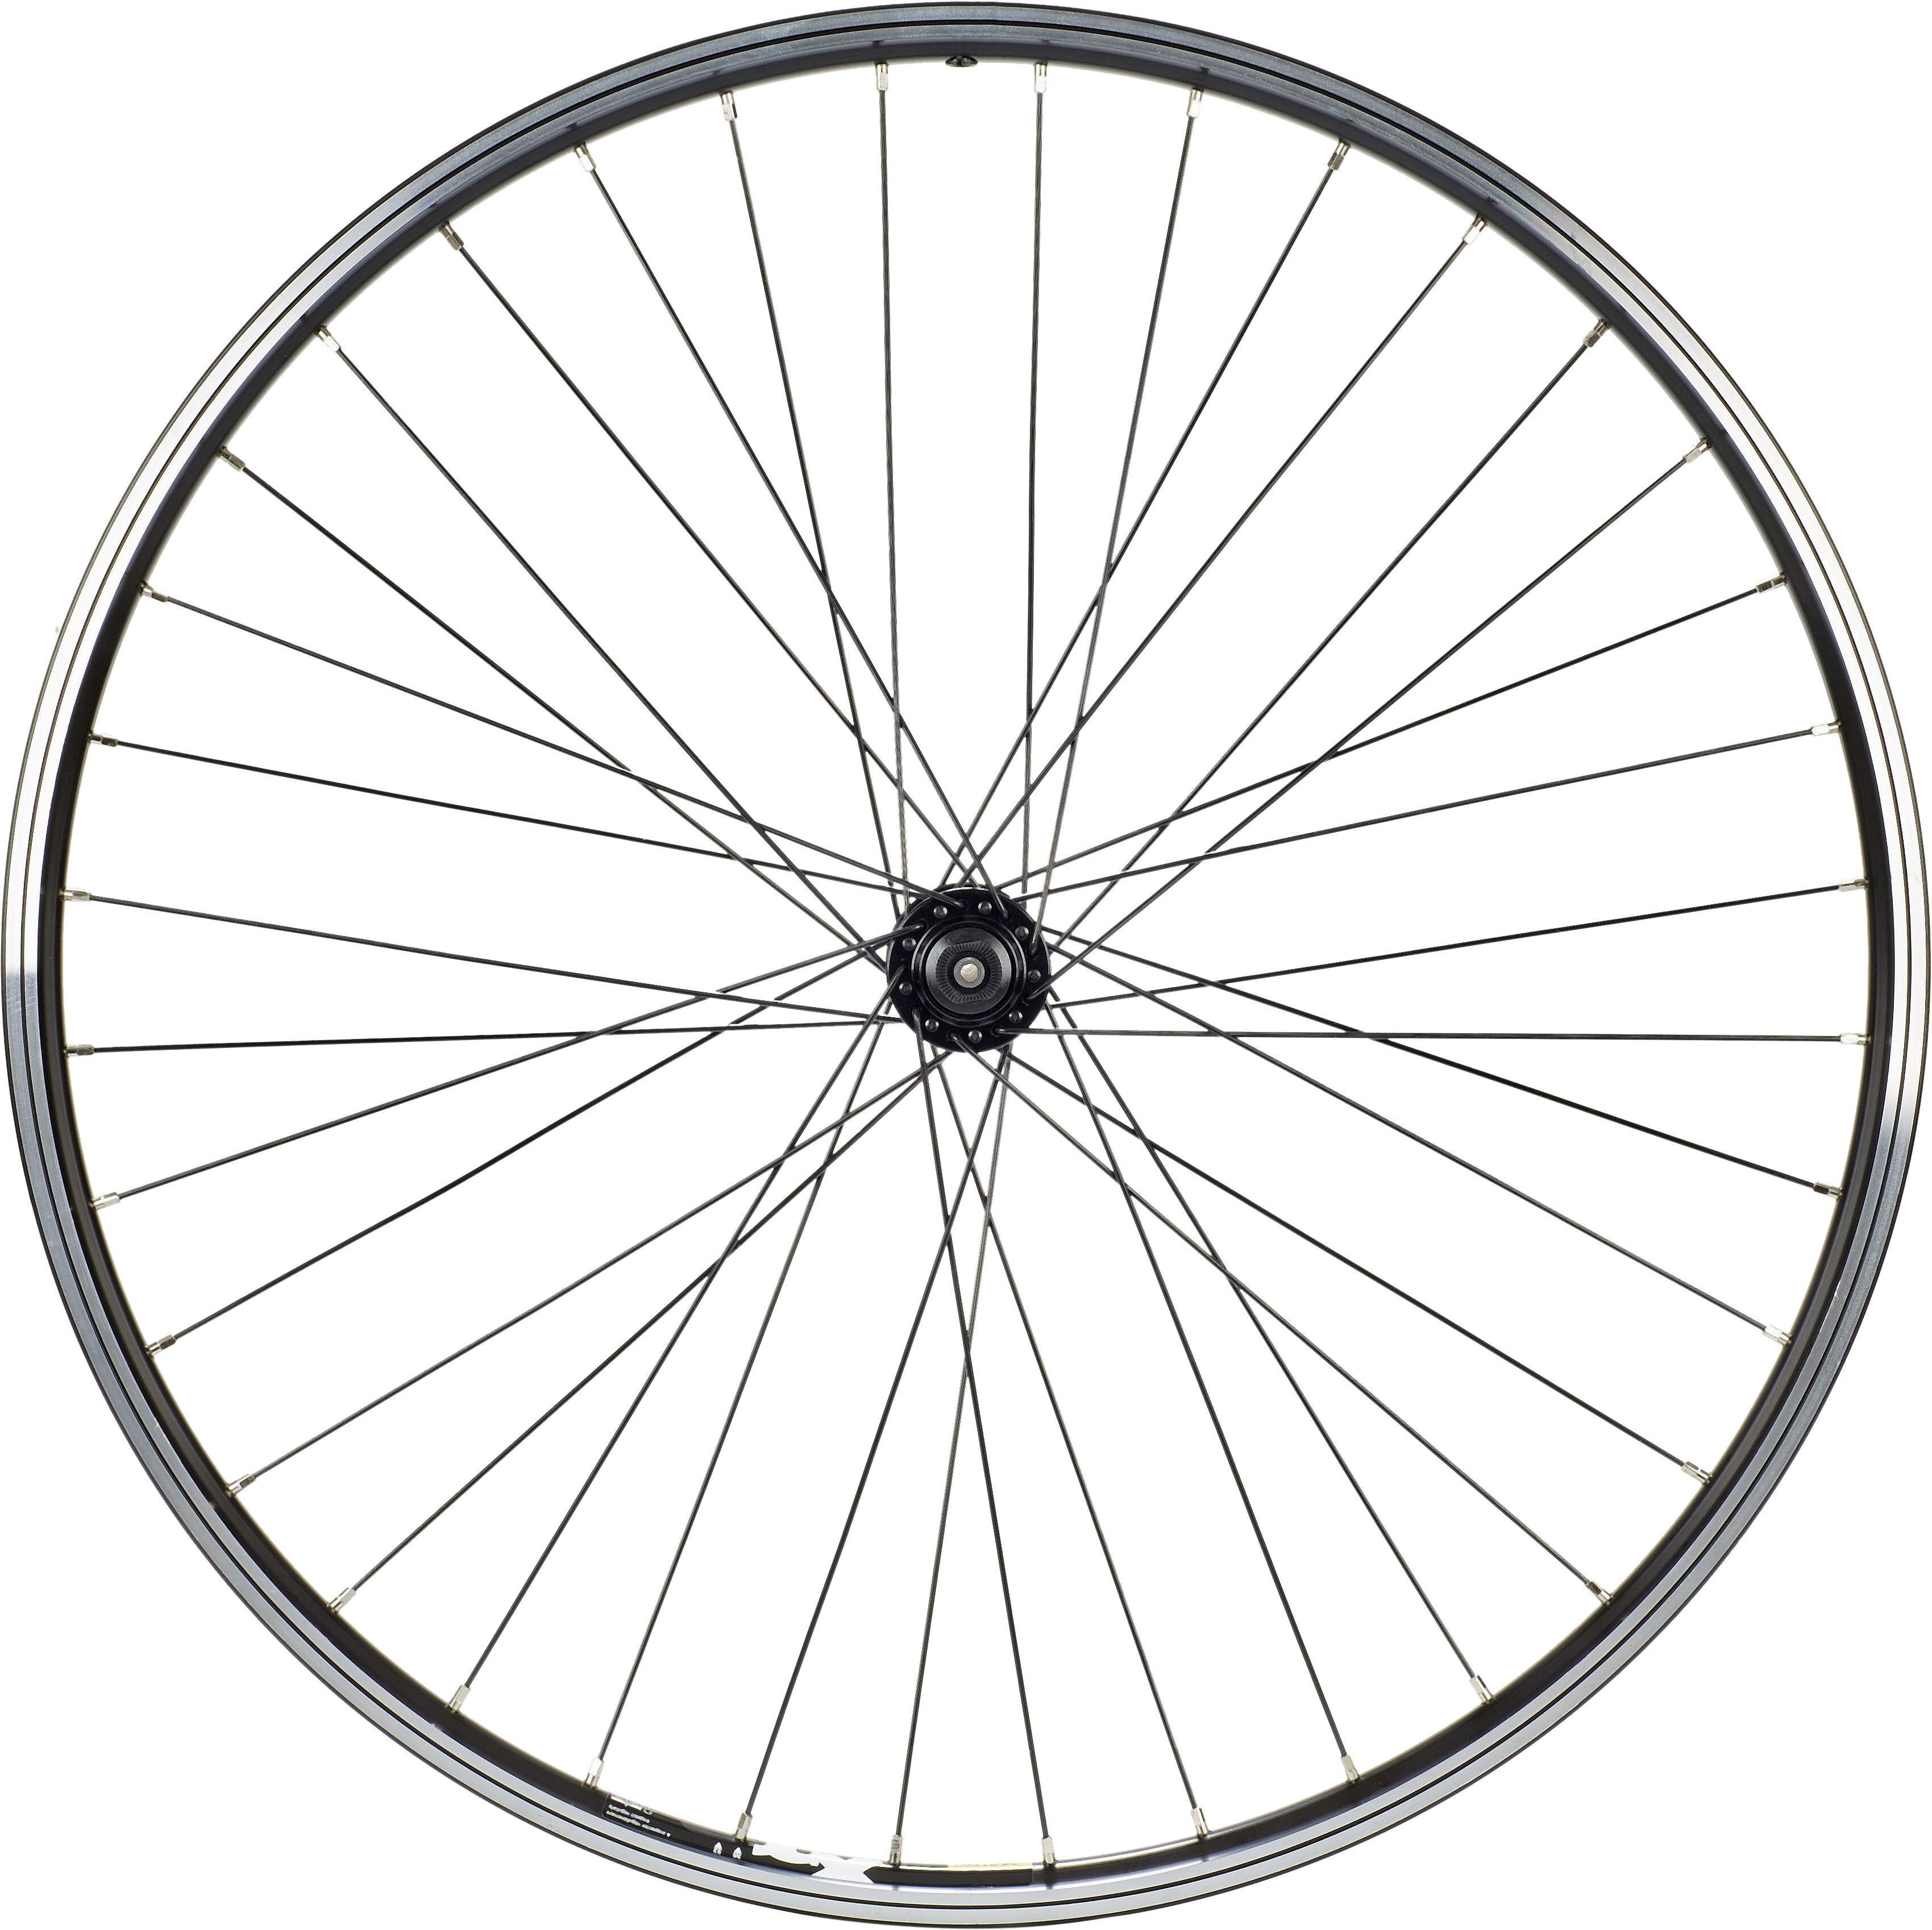 d85158cfc72 Mavic XM 117 Front Wheel 26x1.75 Deore black at Bikester.co.uk